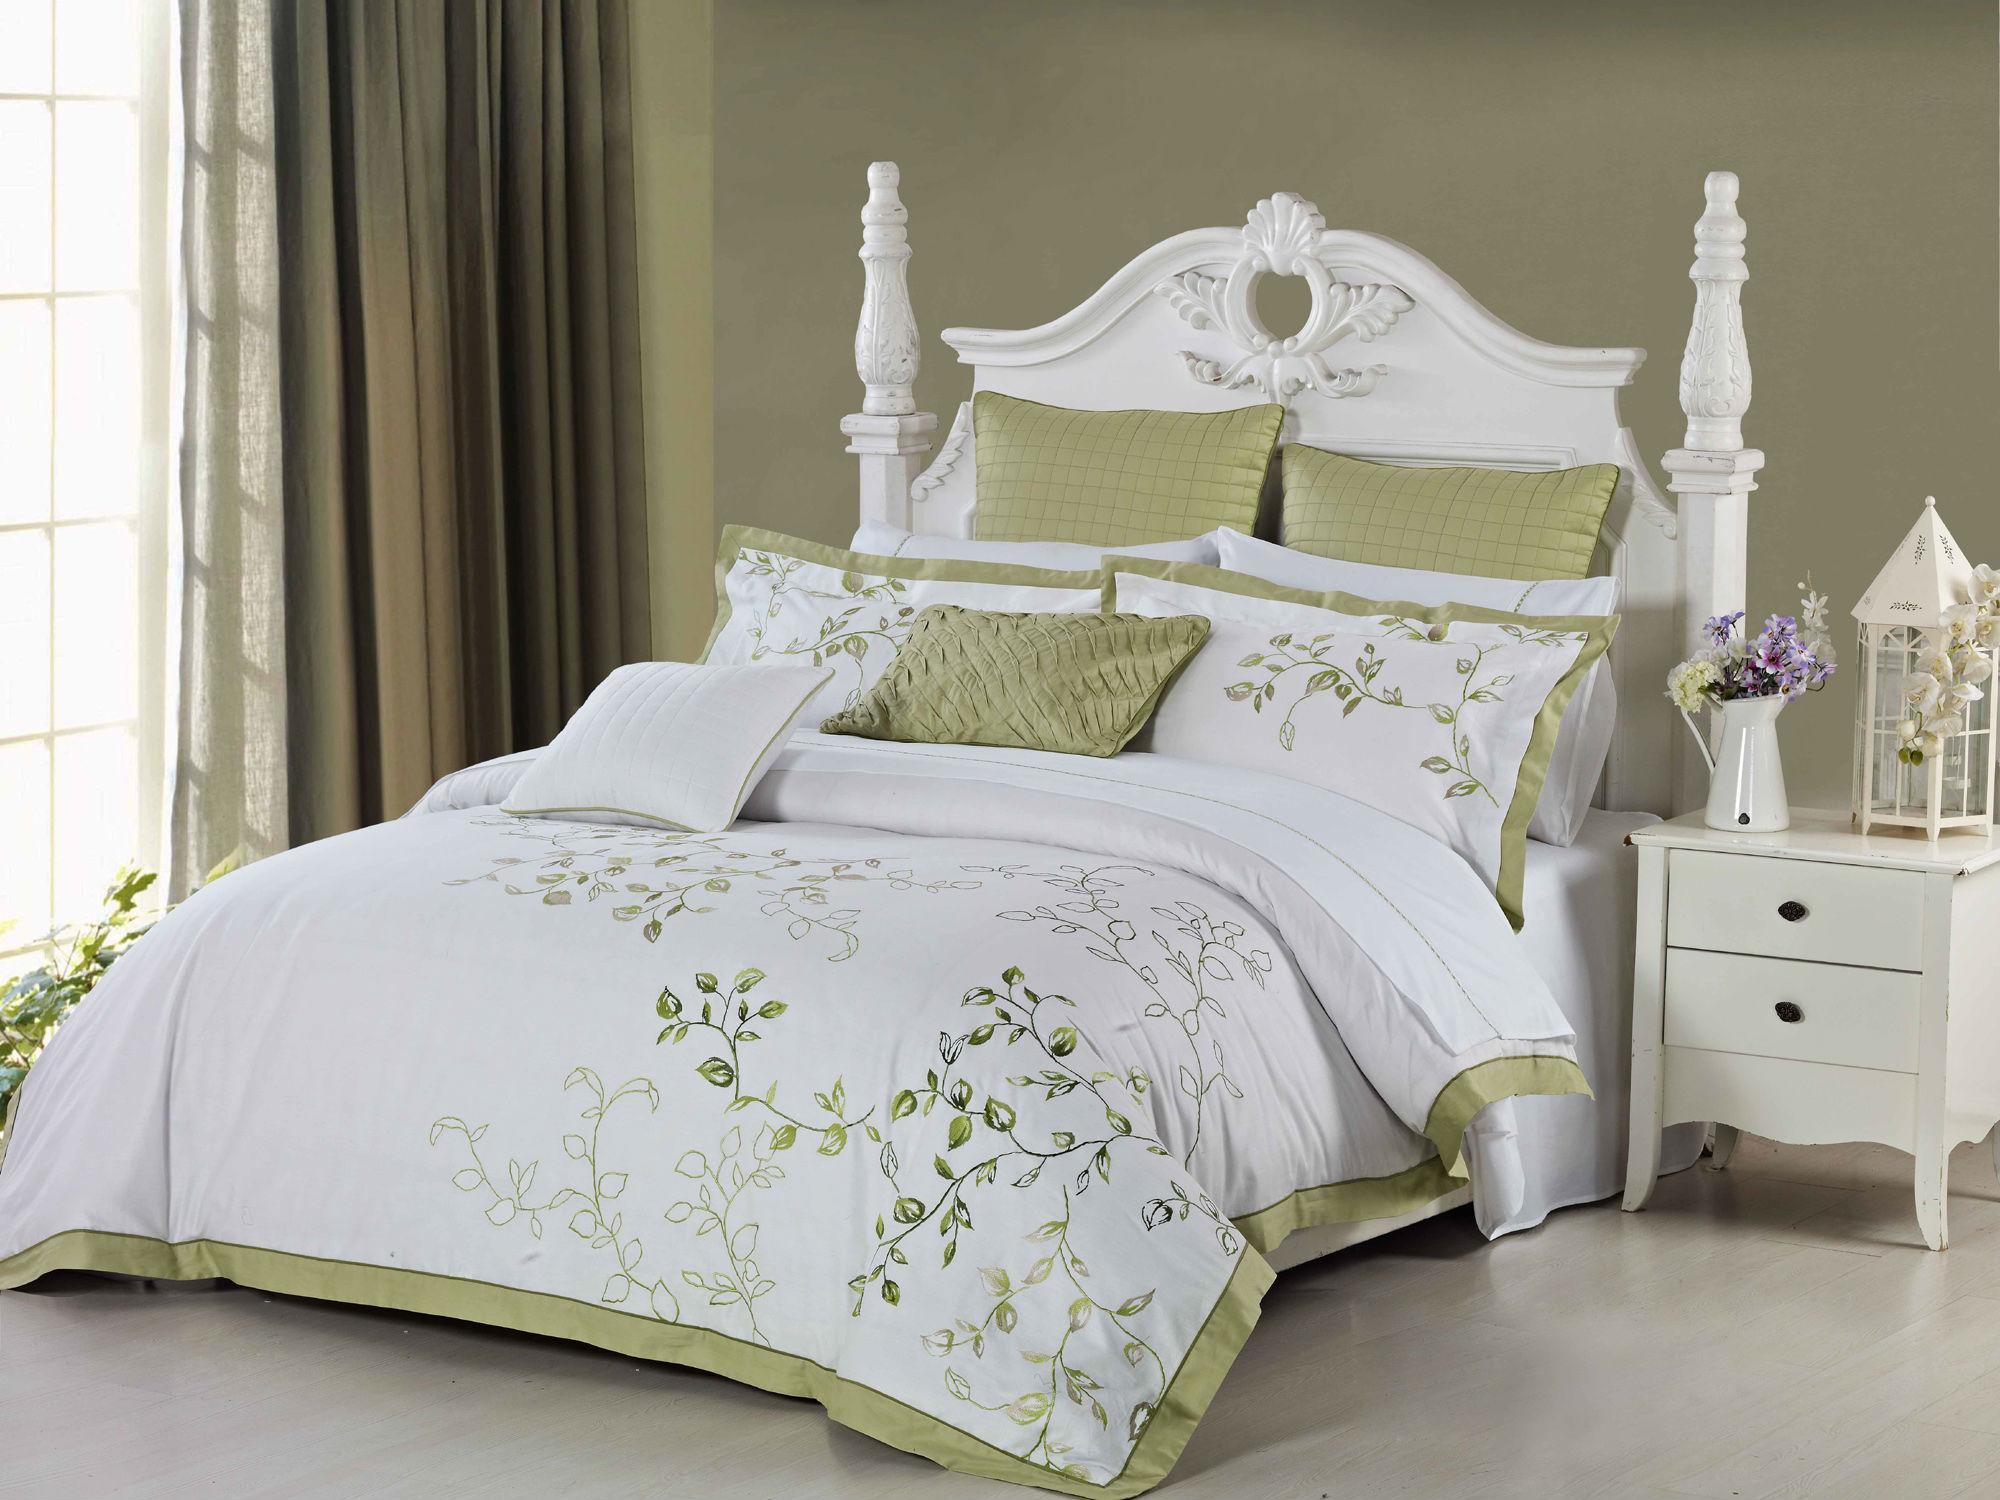 Wisteria By Nygard Home Bedding Beddingsuperstore Com